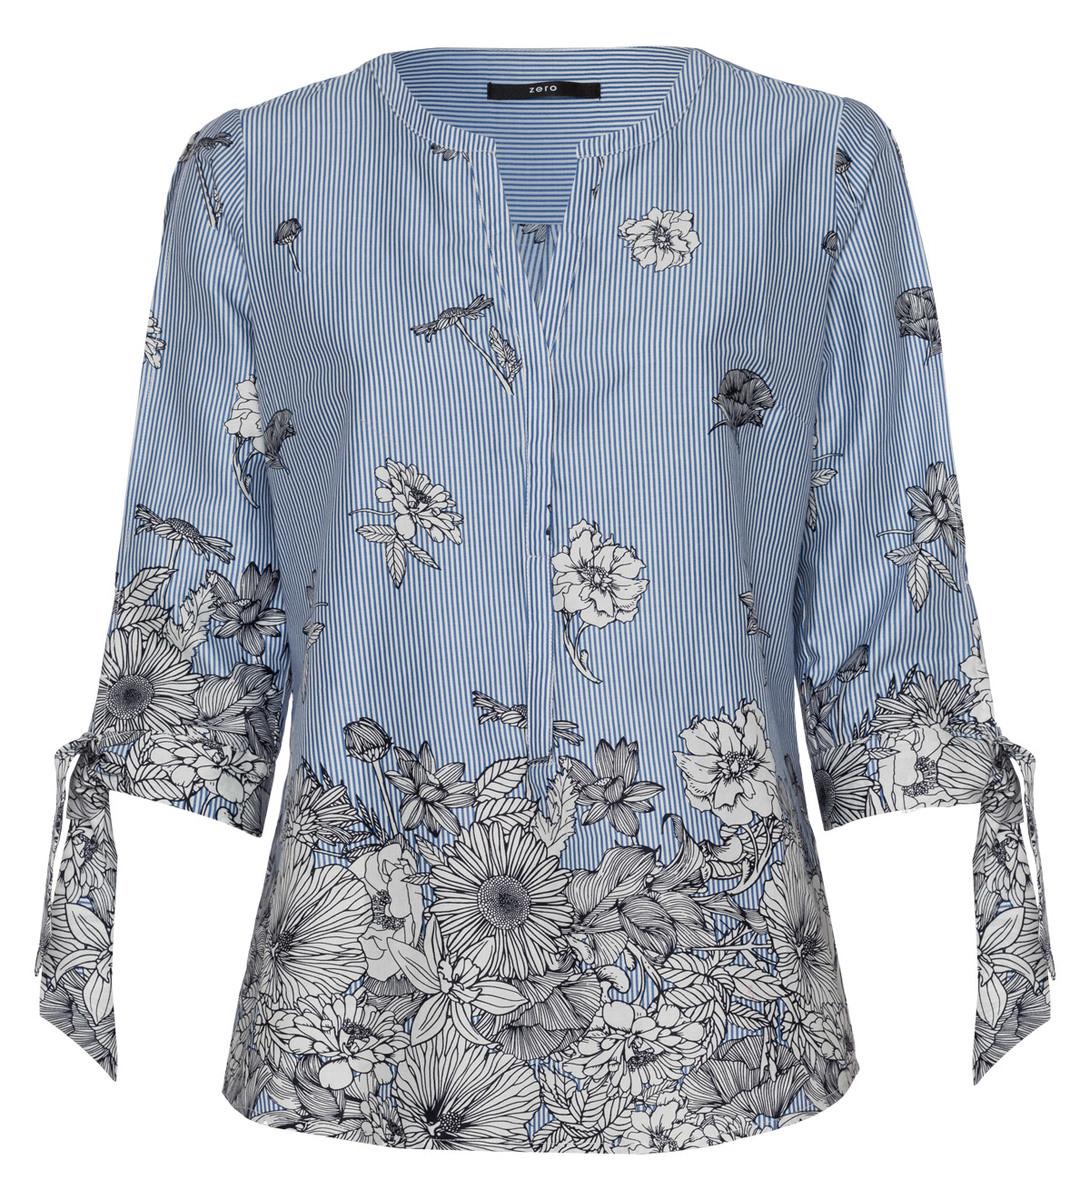 Bluse mit Details in water blue